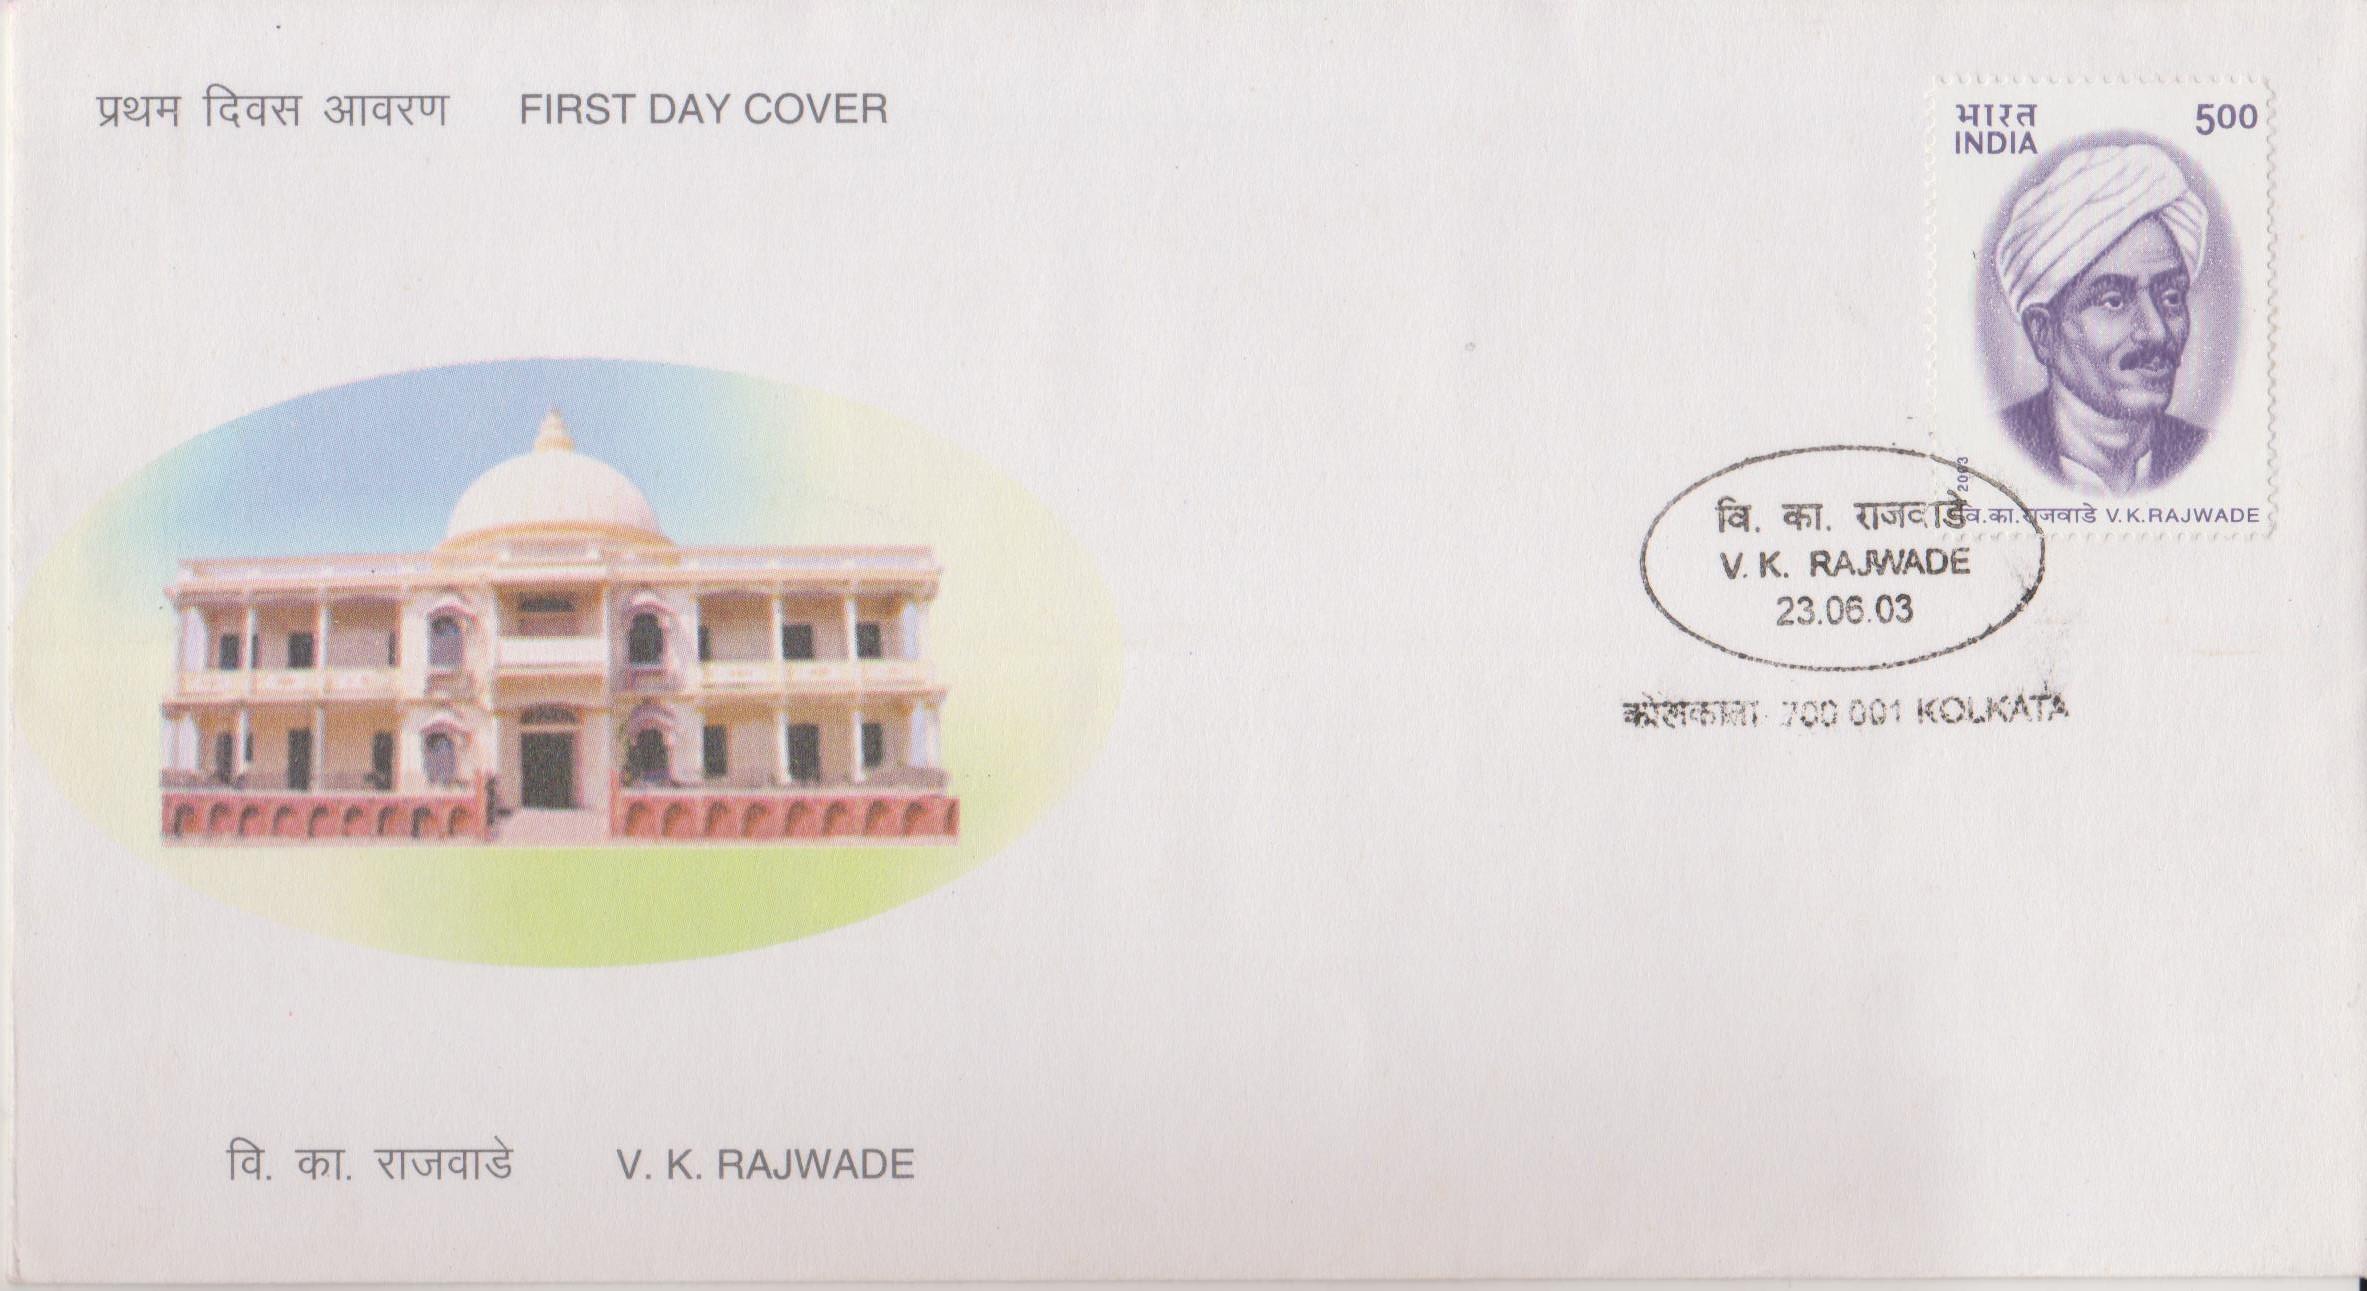 Itihasacharya Rajwade, Maratha history, Itihas Sanshodhak Mandal